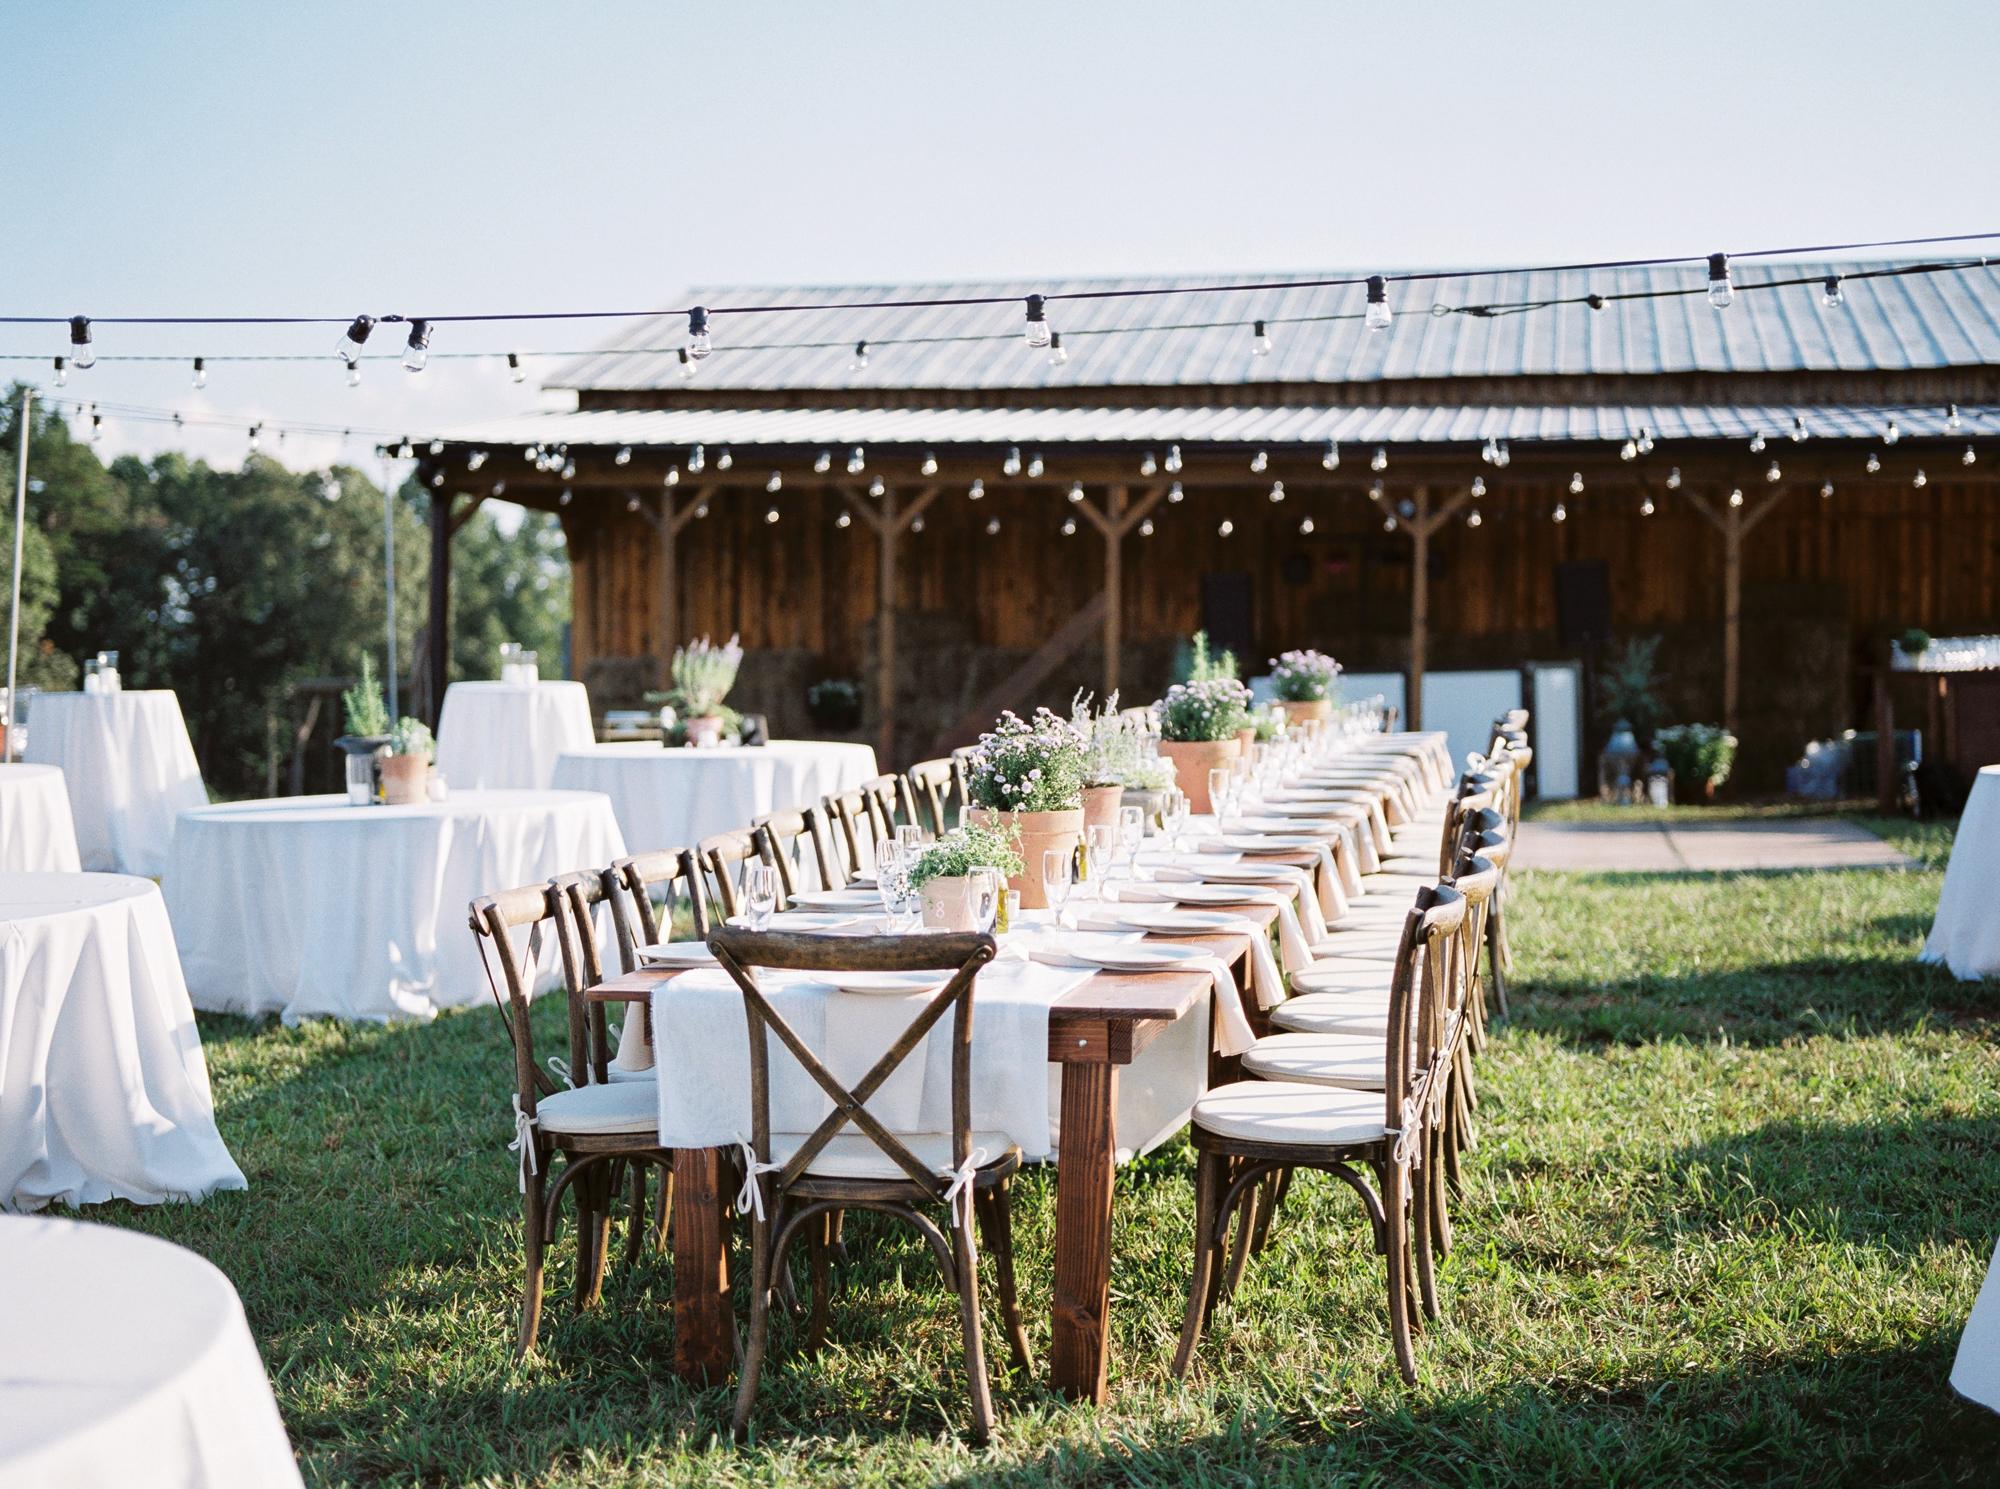 table setting at farmhouse wedding reception